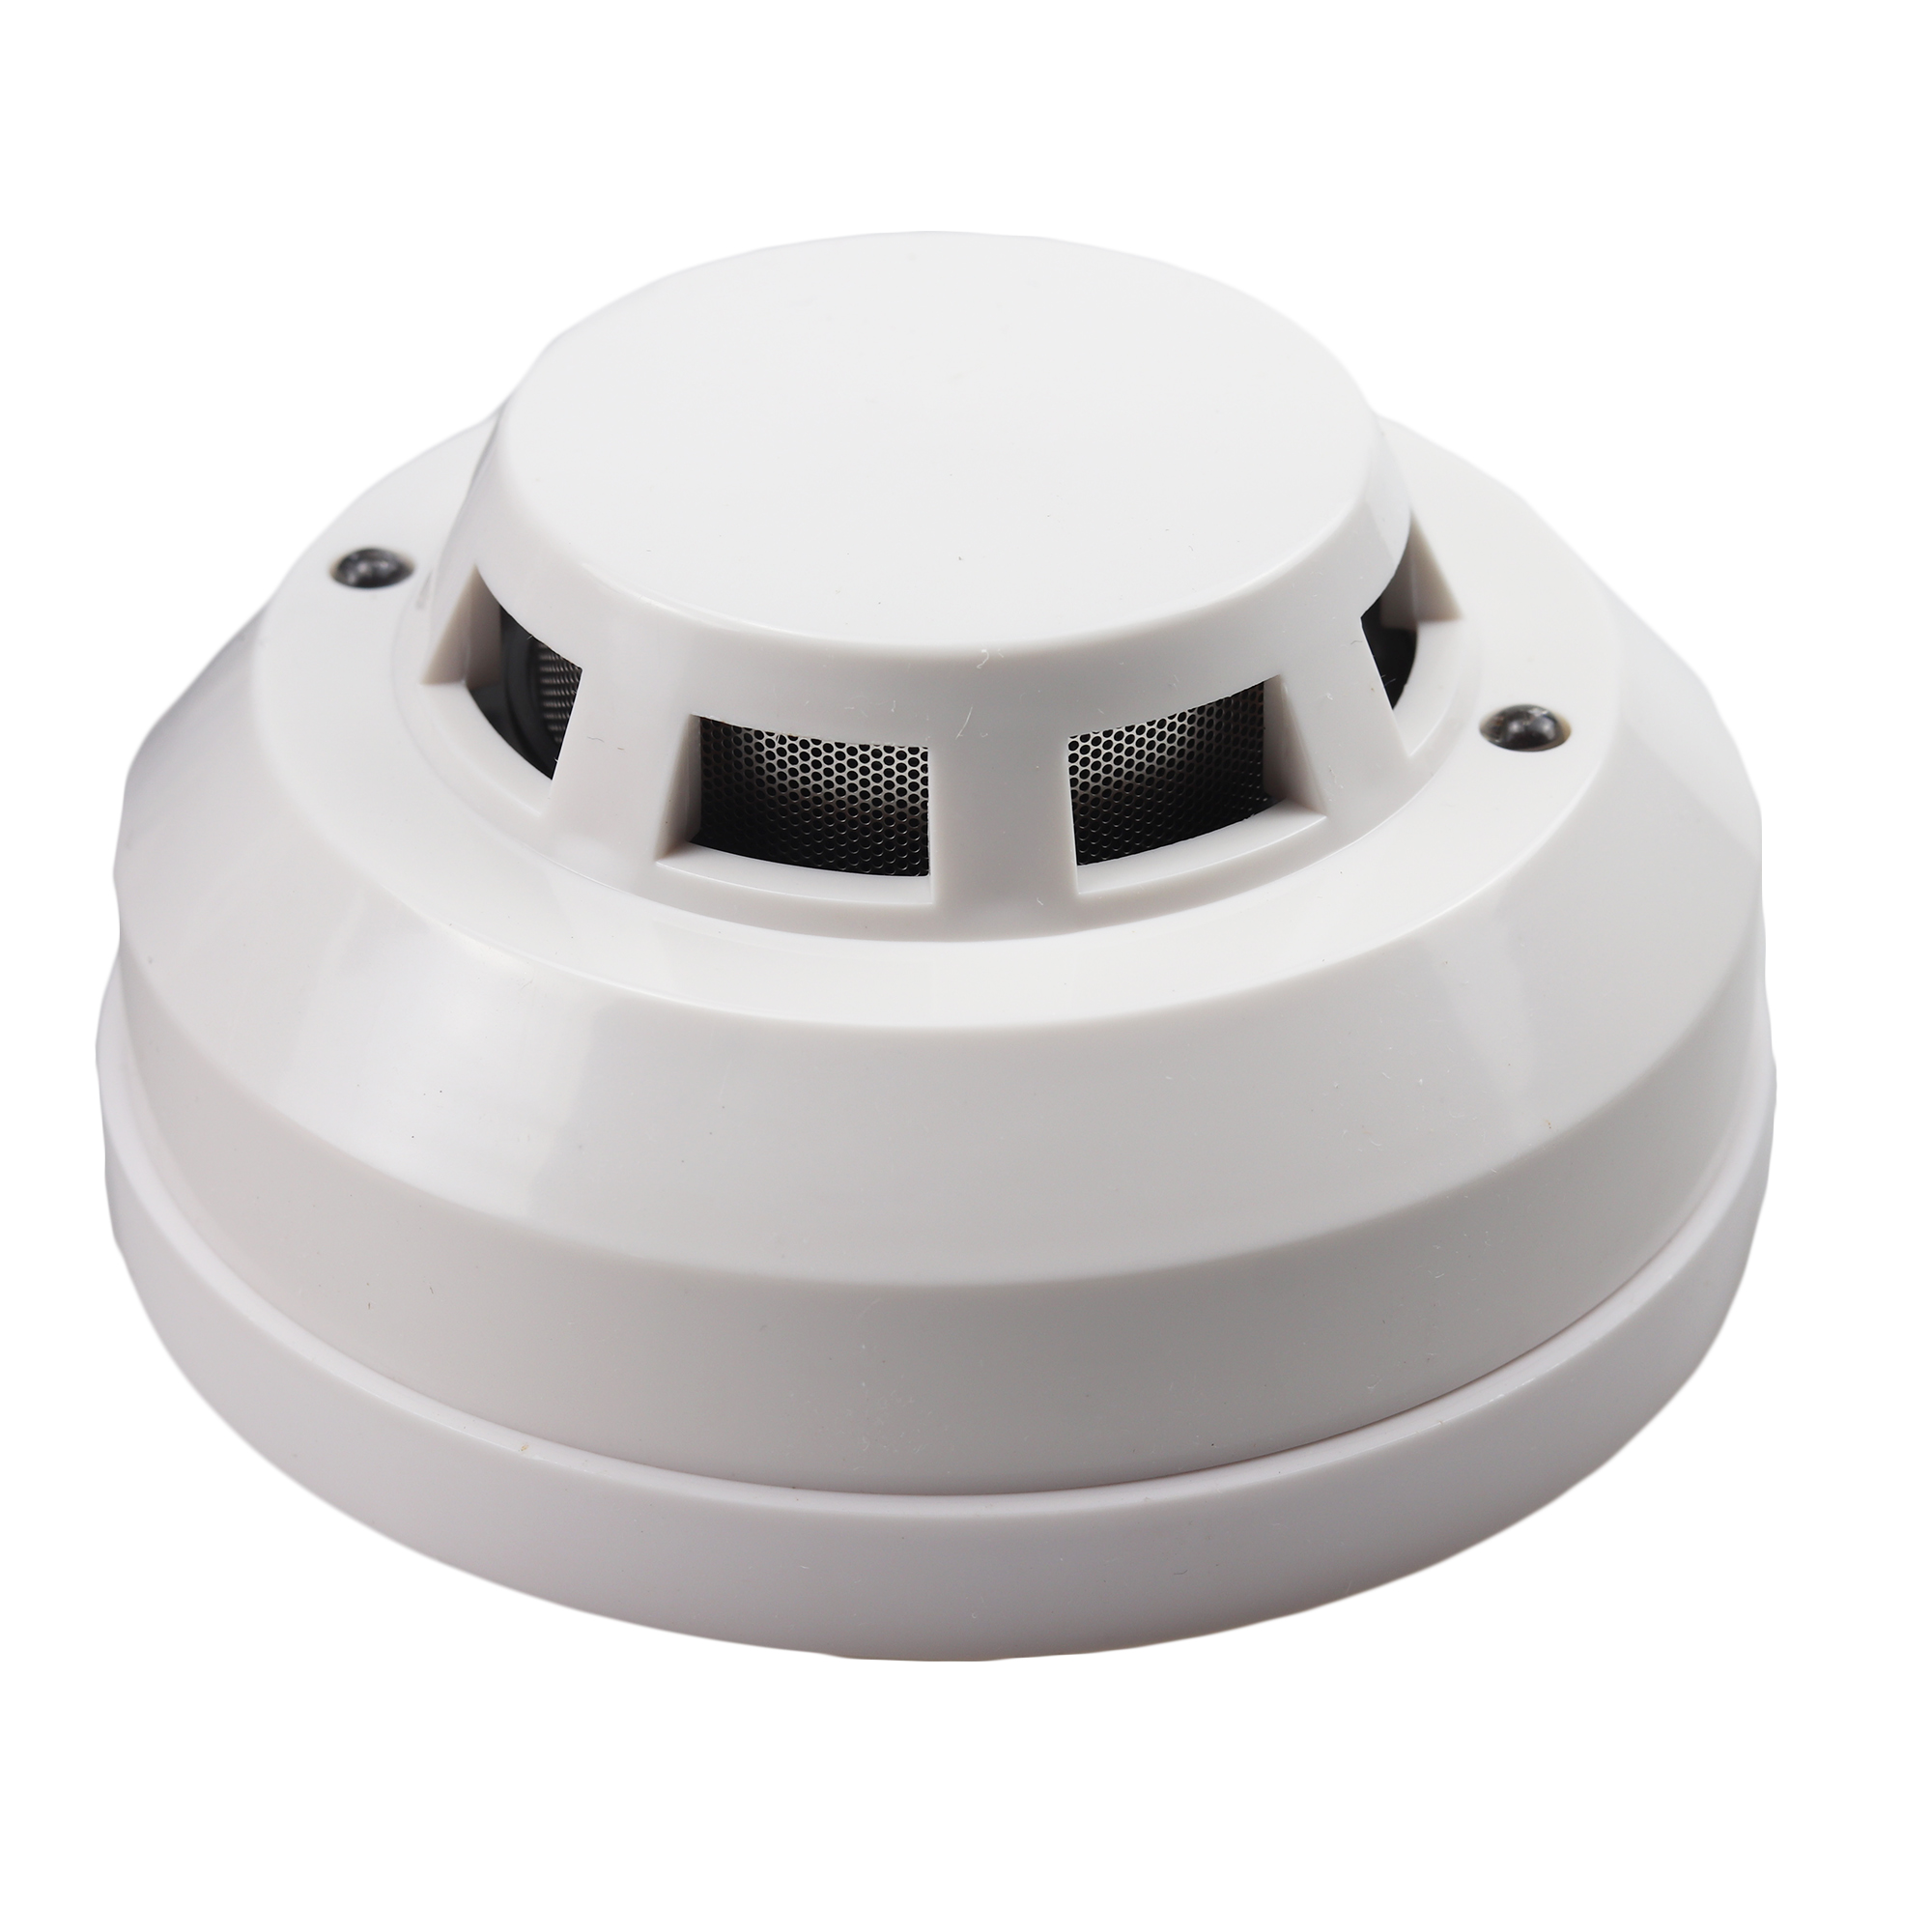 Image 5 - GZGMET 12V DC Smoke Detector Photoelectric Home Alarm Sensor Fire Security Detector for Wired Alarm System-in Smoke Detector from Security & Protection